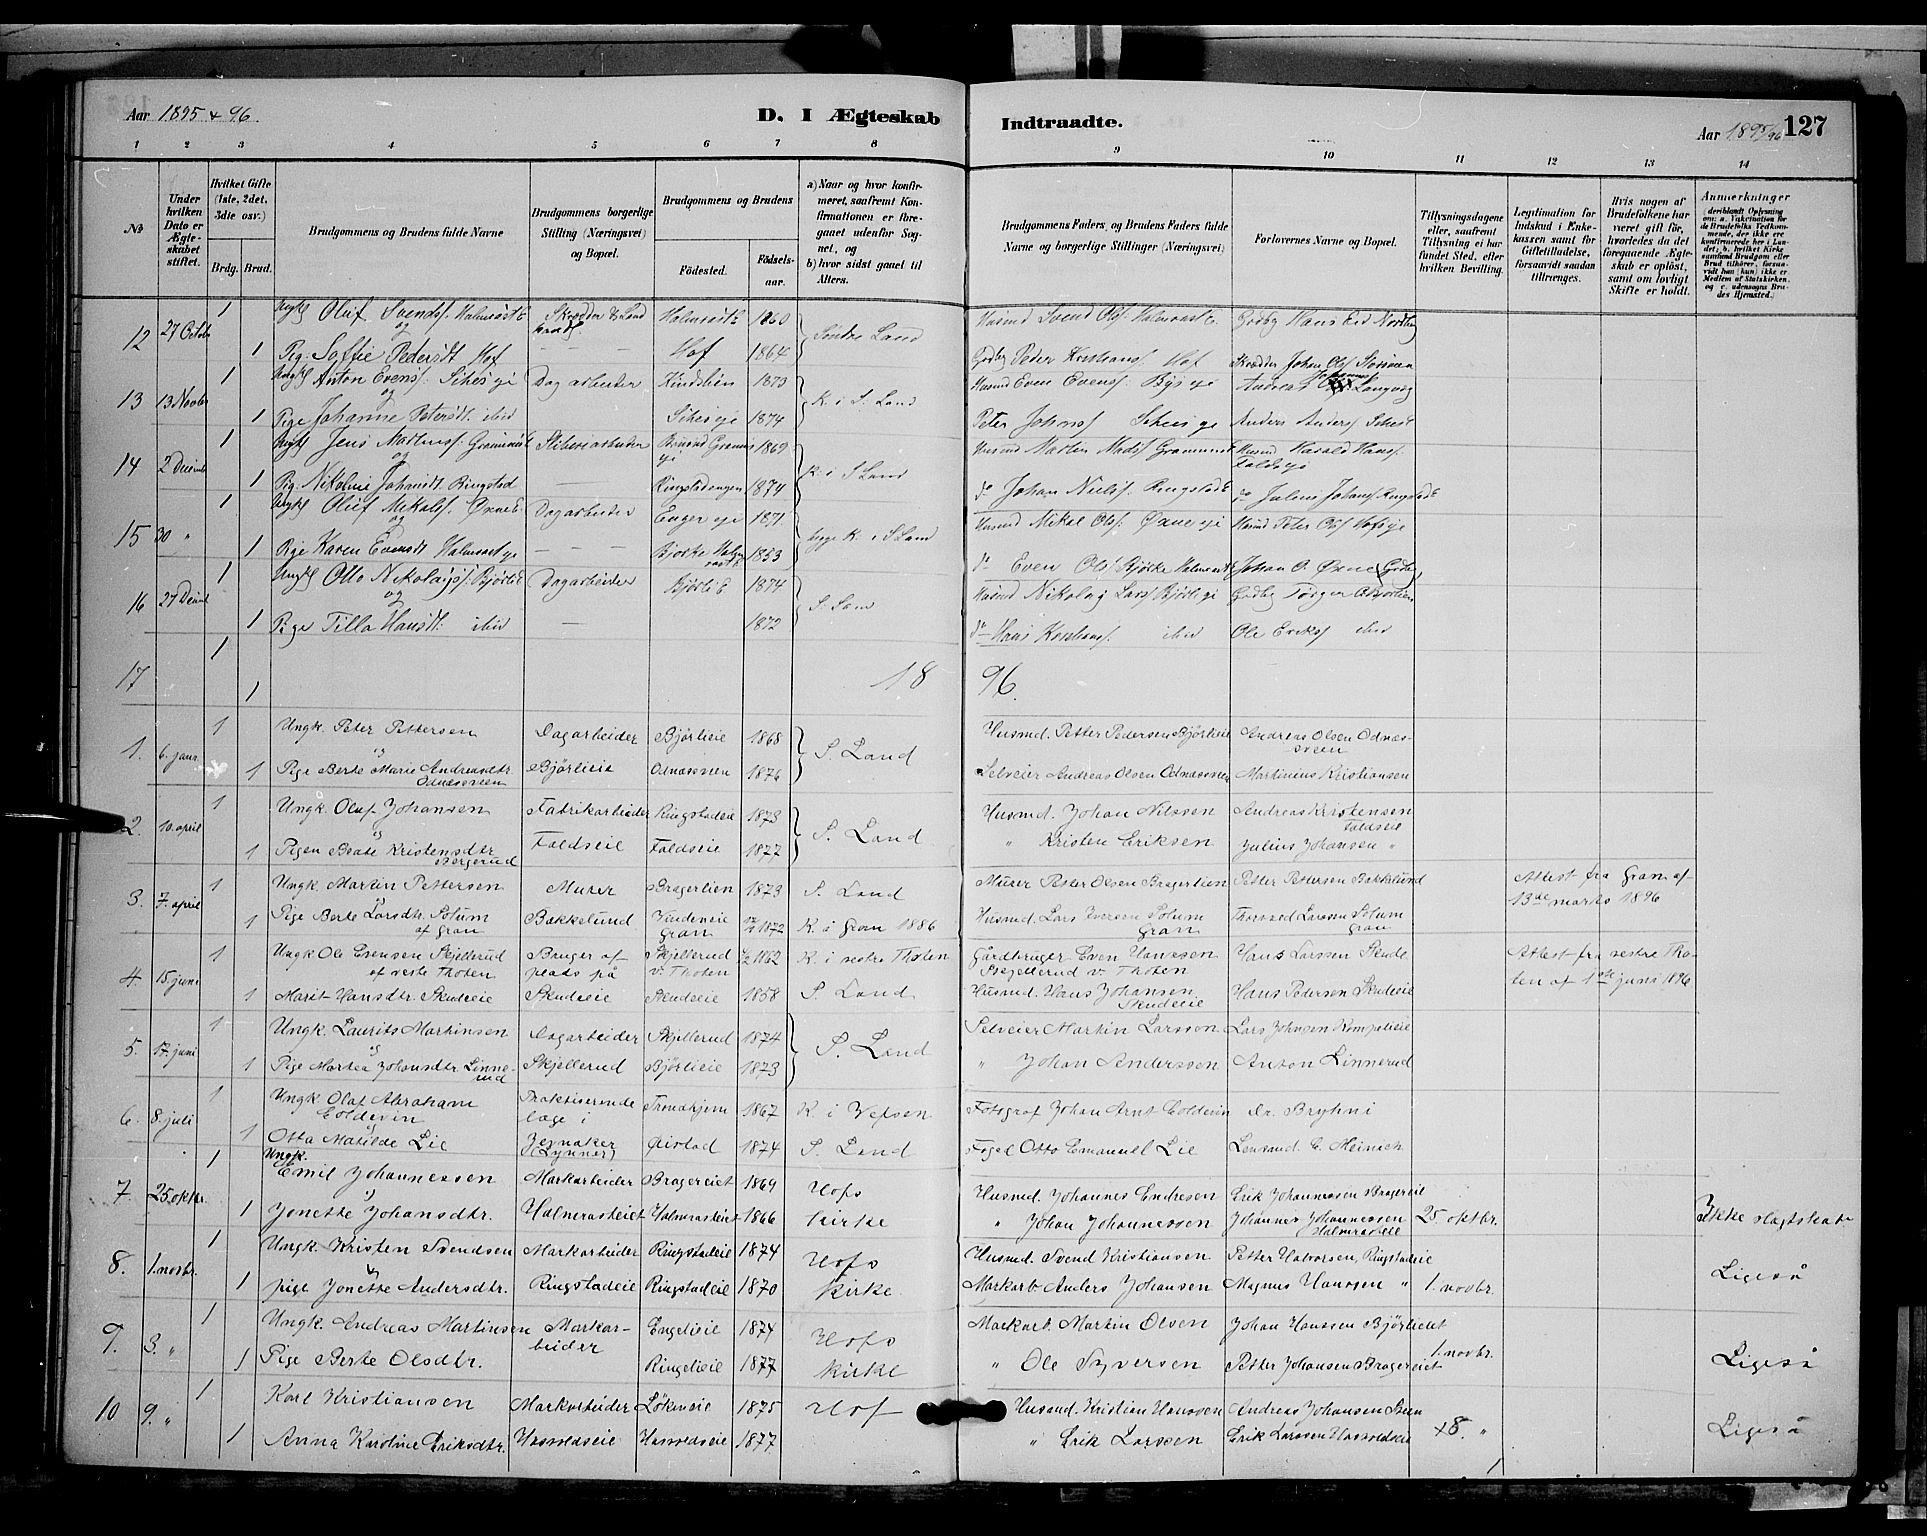 SAH, Søndre Land prestekontor, L/L0002: Klokkerbok nr. 2, 1884-1900, s. 127